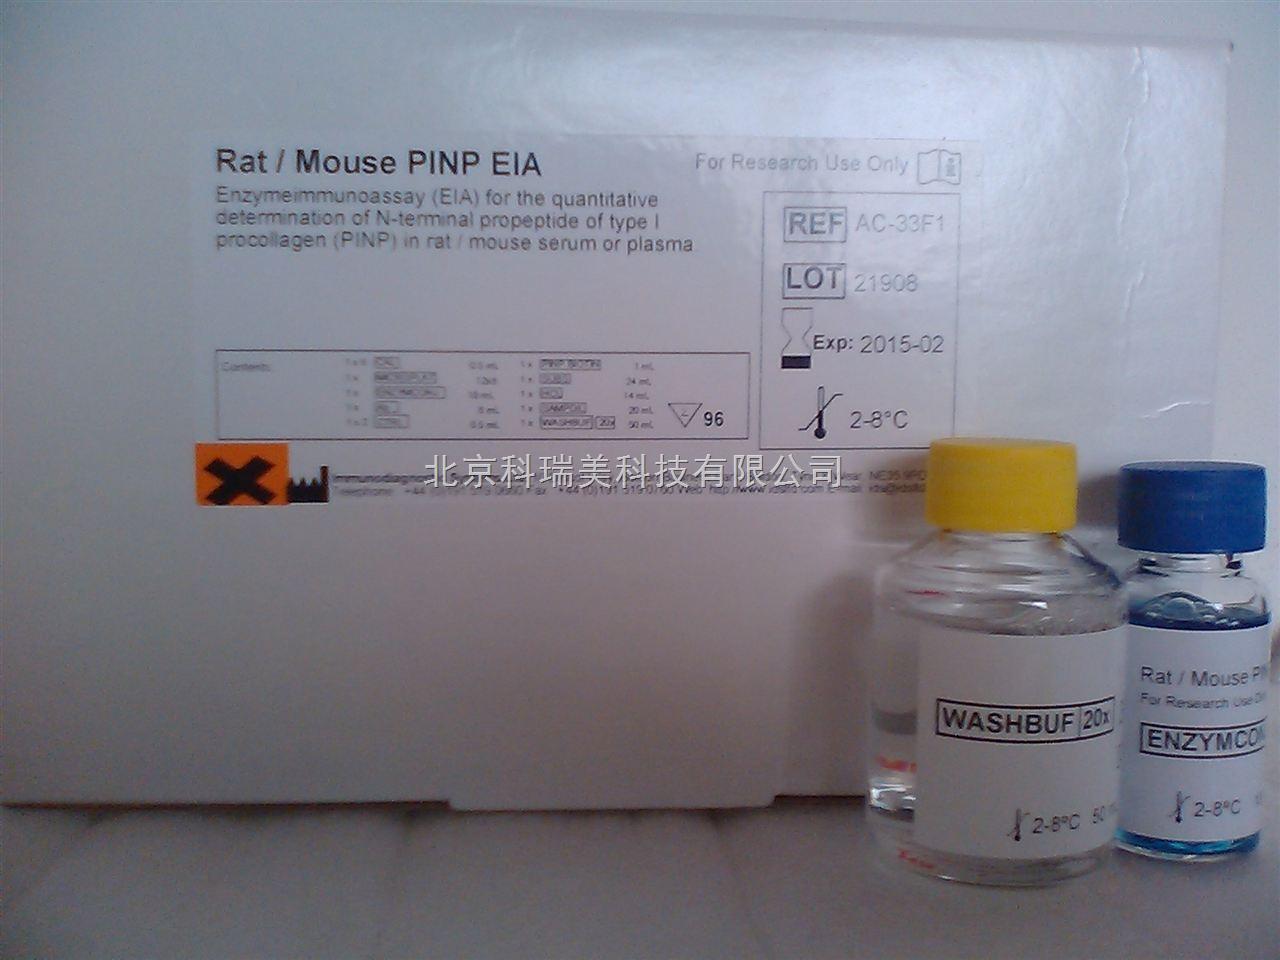 Rat/Mouse PINP ELISA  Kit